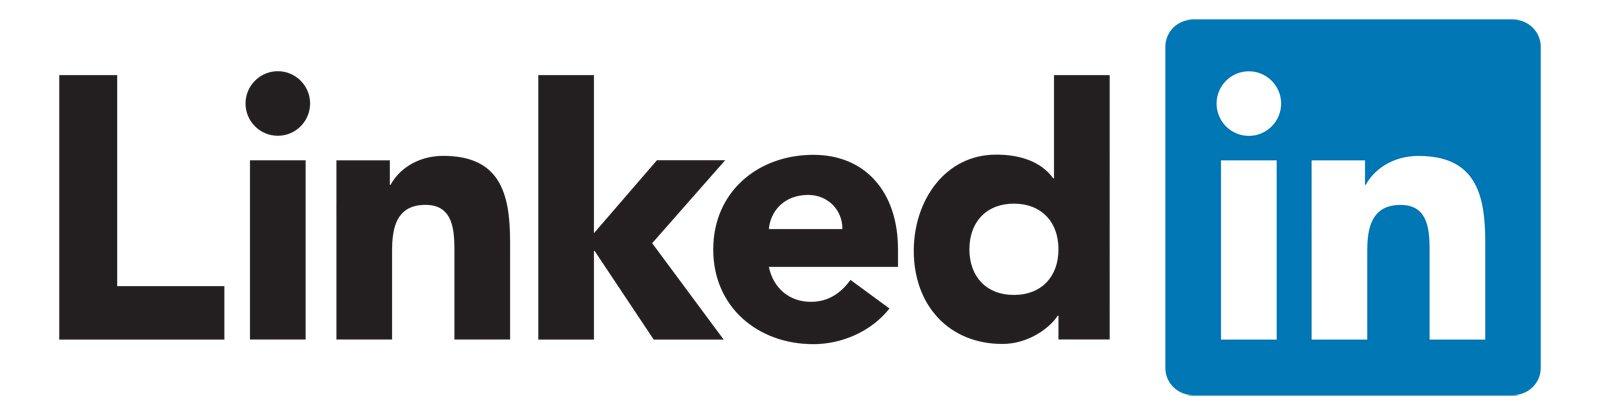 Linkedin Logo Linkedin Symbol Meaning History And Evolution